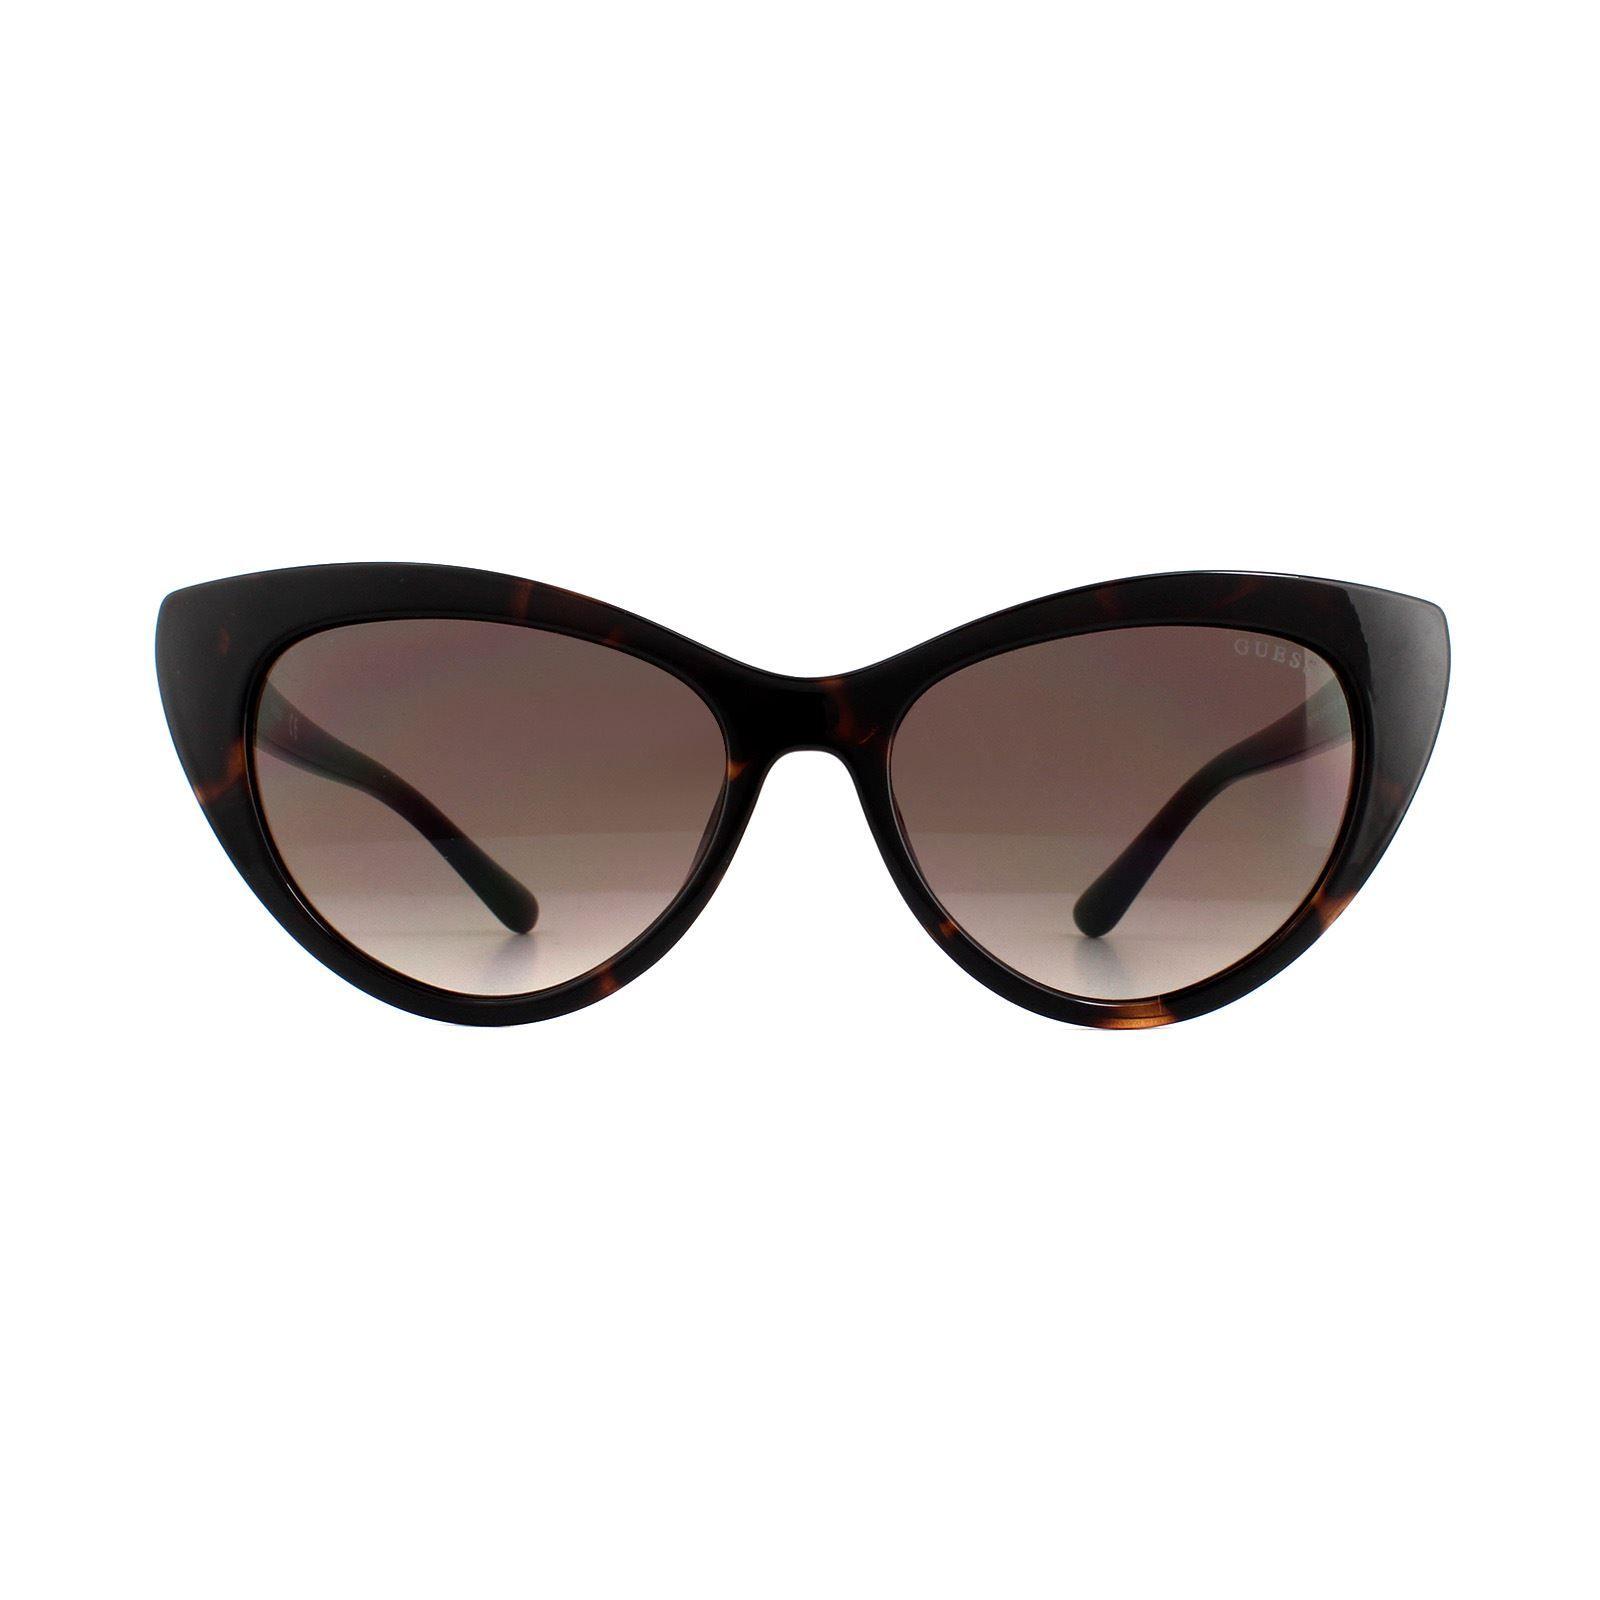 Guess Sunglasses GU7565 52F Dark Havana Brown Gradient